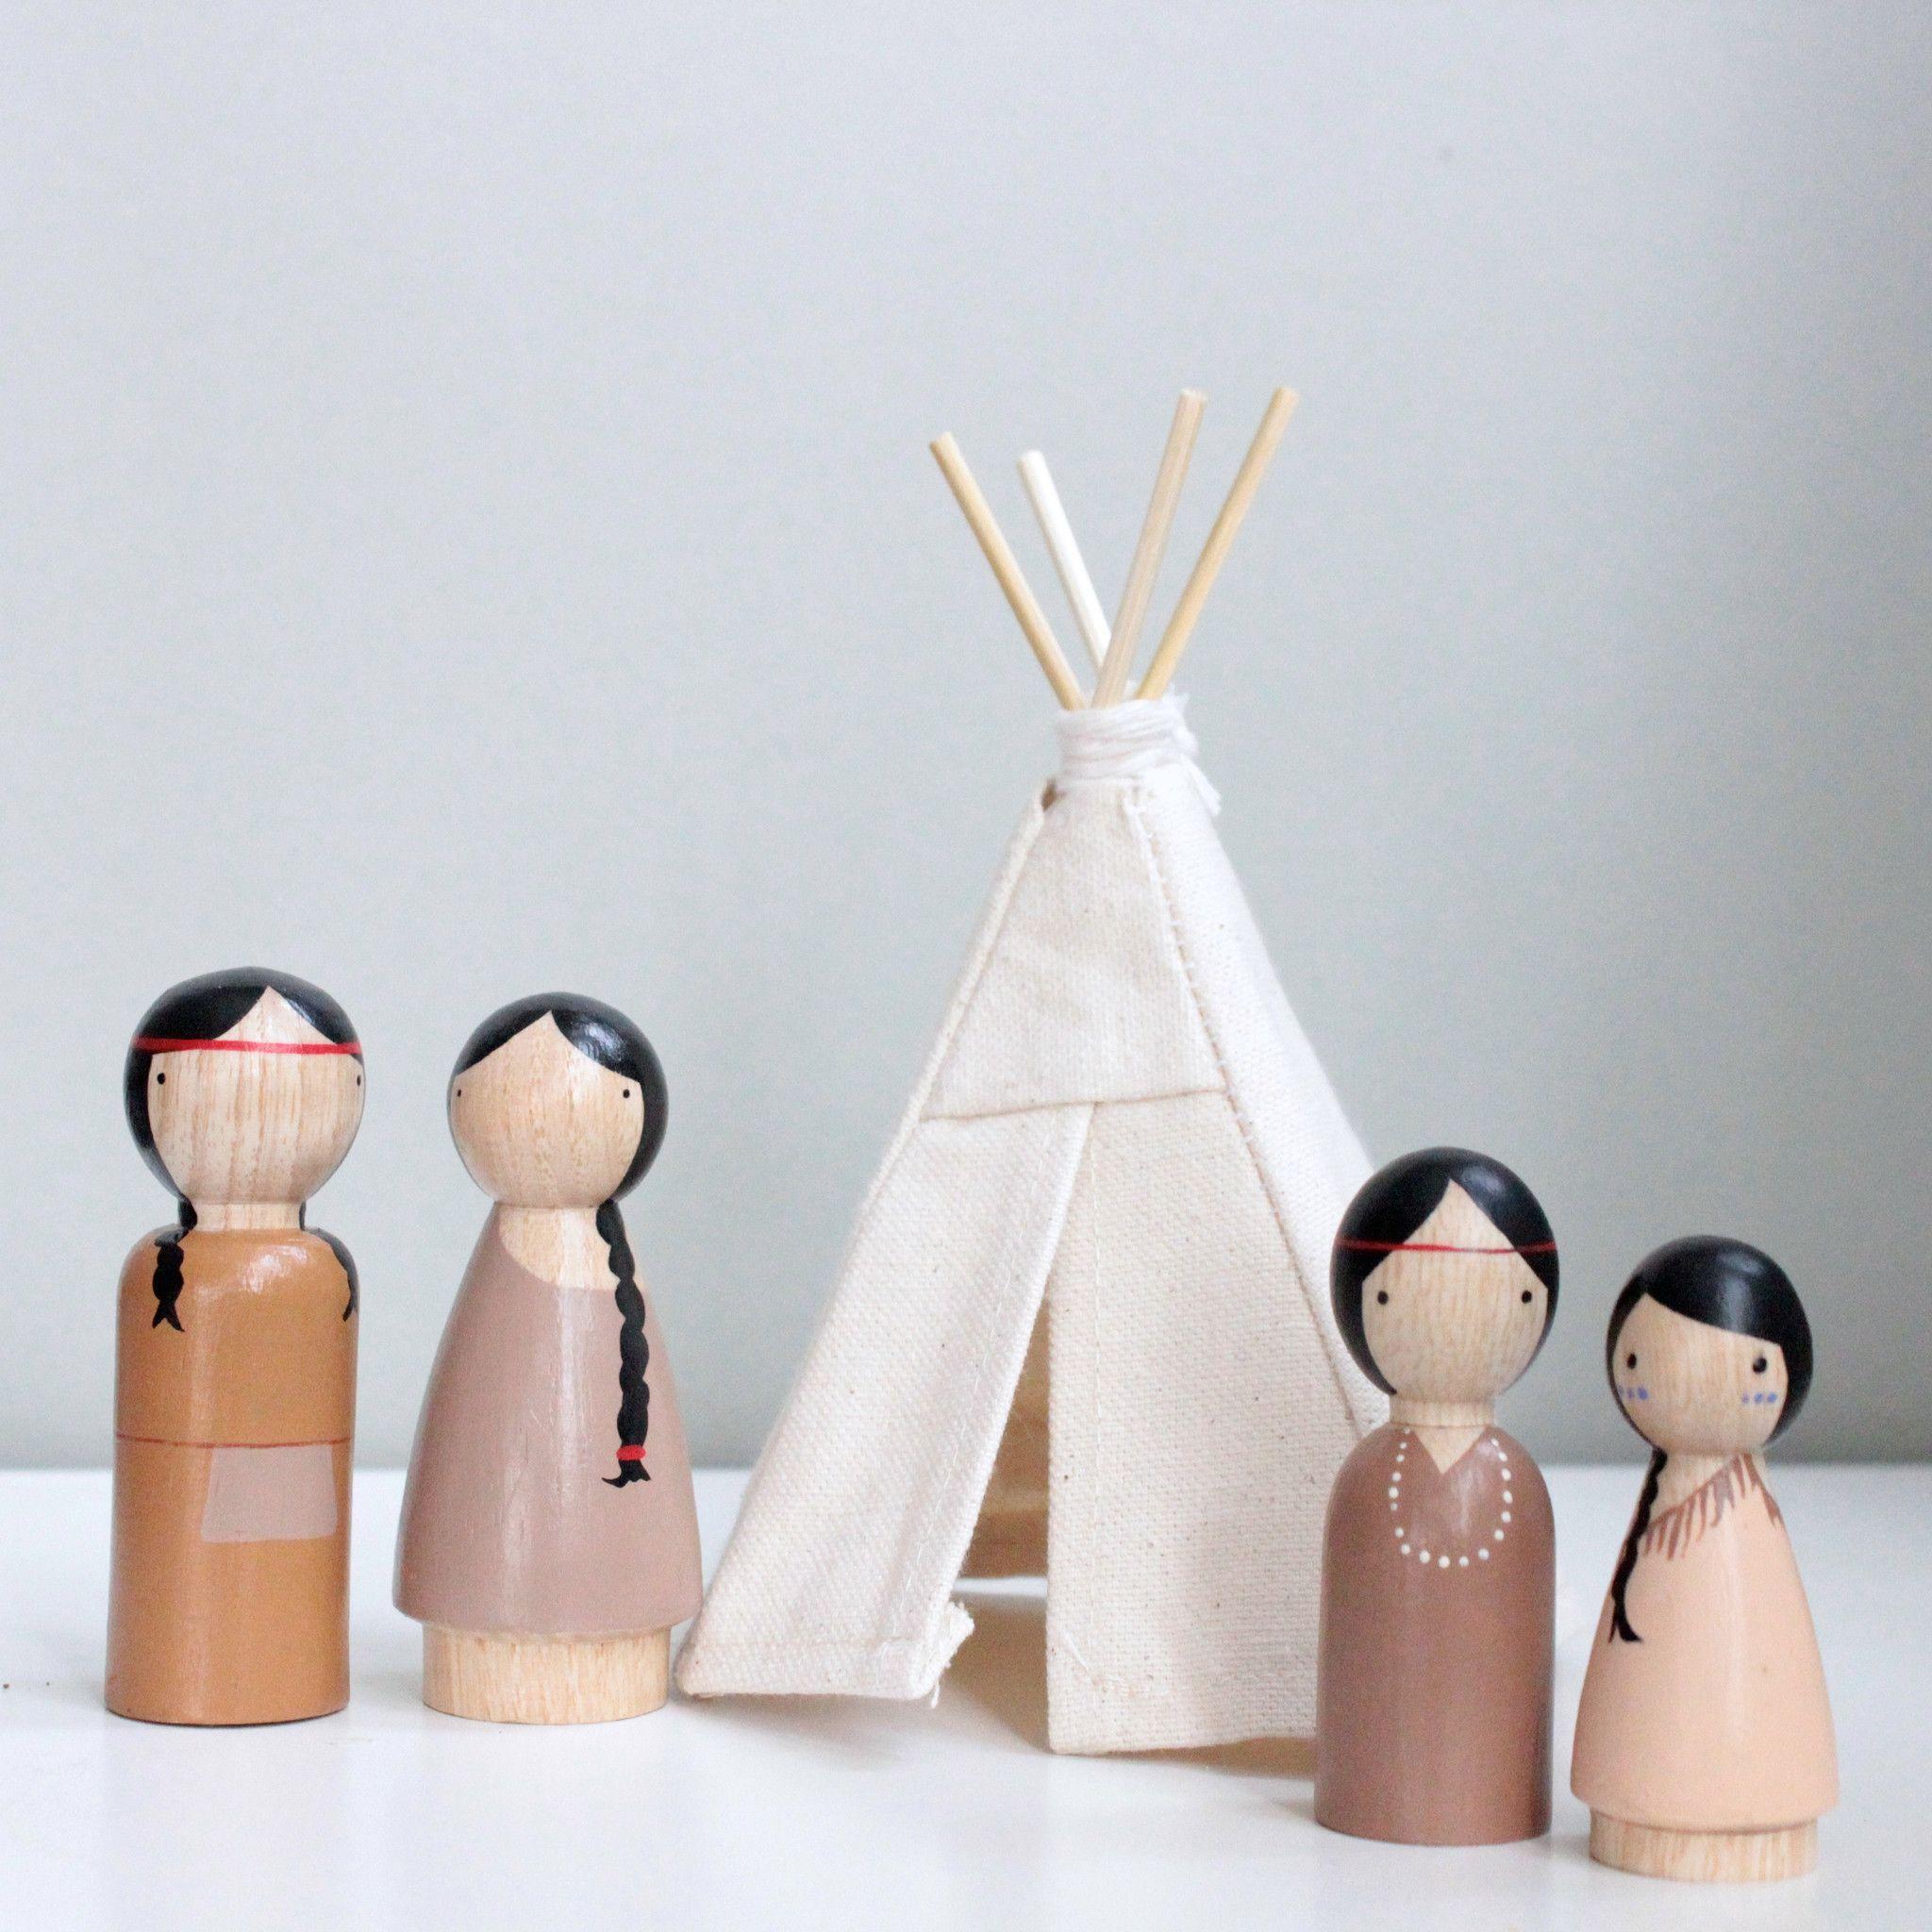 Dollhouse Teepee, tipi for doll house with peg dolls #americandolls